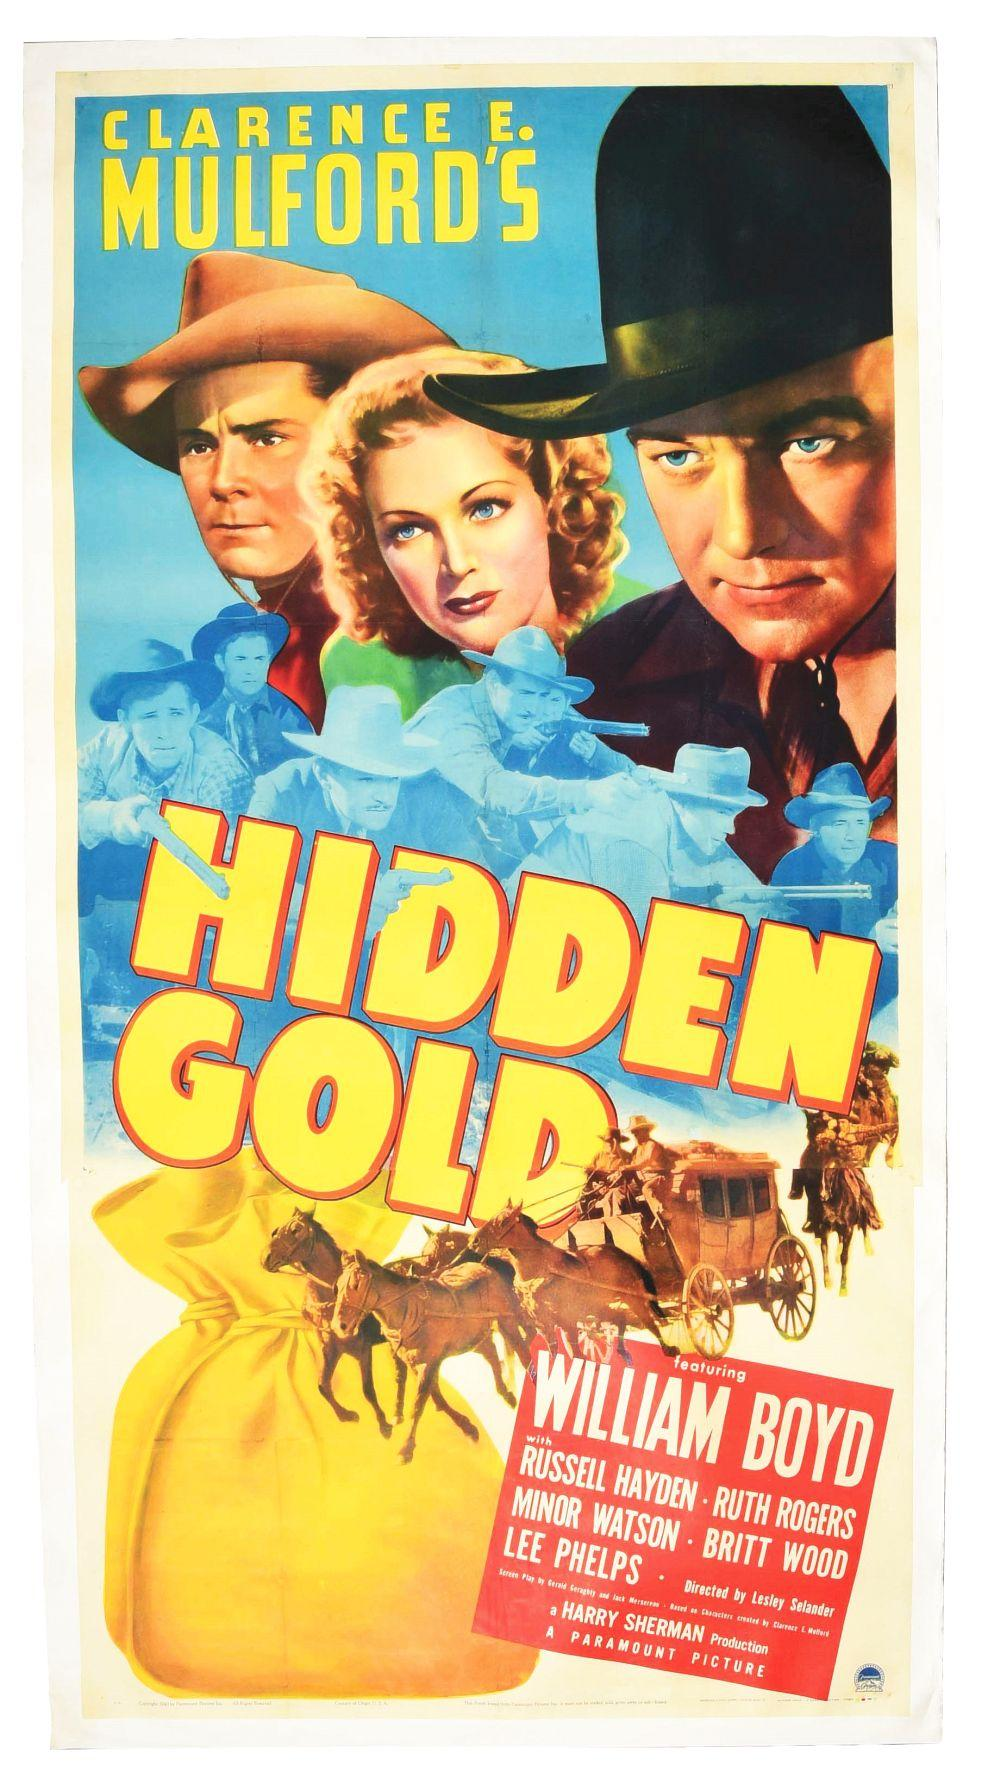 Lot 2352: Scarce William Boyd Hopalong Cassidy Movie Poster.